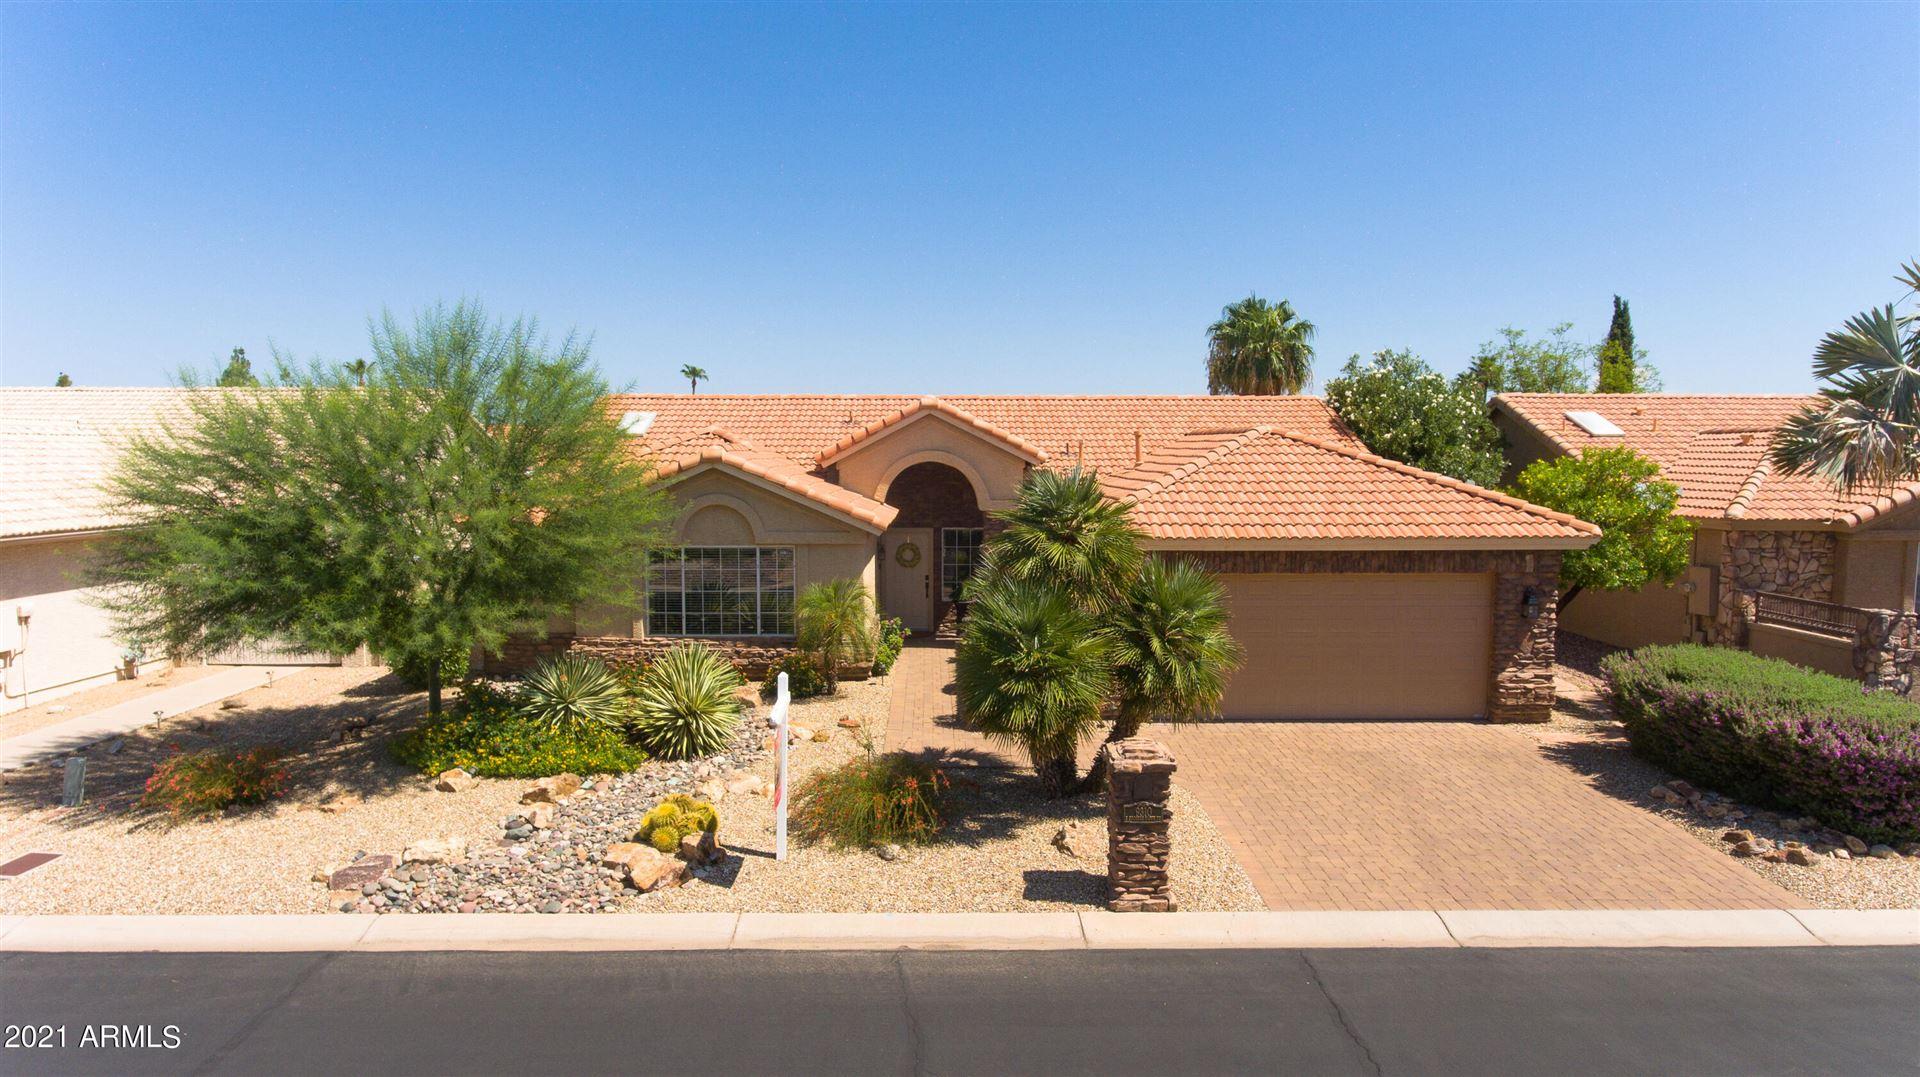 Photo of 9310 E COOPERS HAWK Drive, Sun Lakes, AZ 85248 (MLS # 6272127)